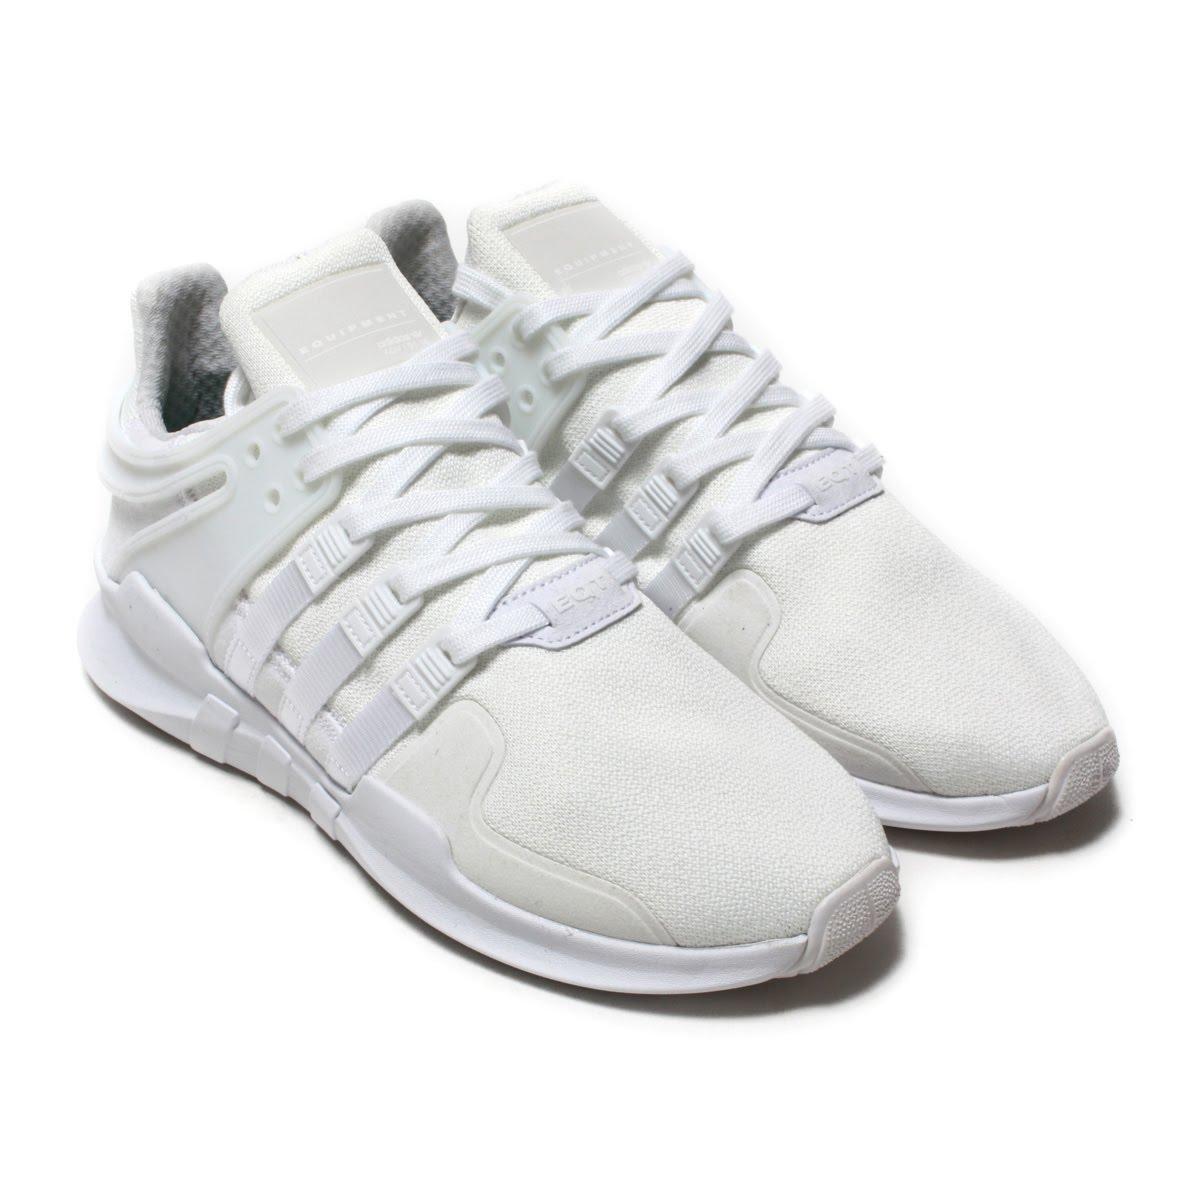 adidas Originals EQT SUPPORT ADV(アディダス オリジナルス イーキューティー サポート ADV)Running White/Running White/Core Black【メンズ レディース スニーカー】18SS-I